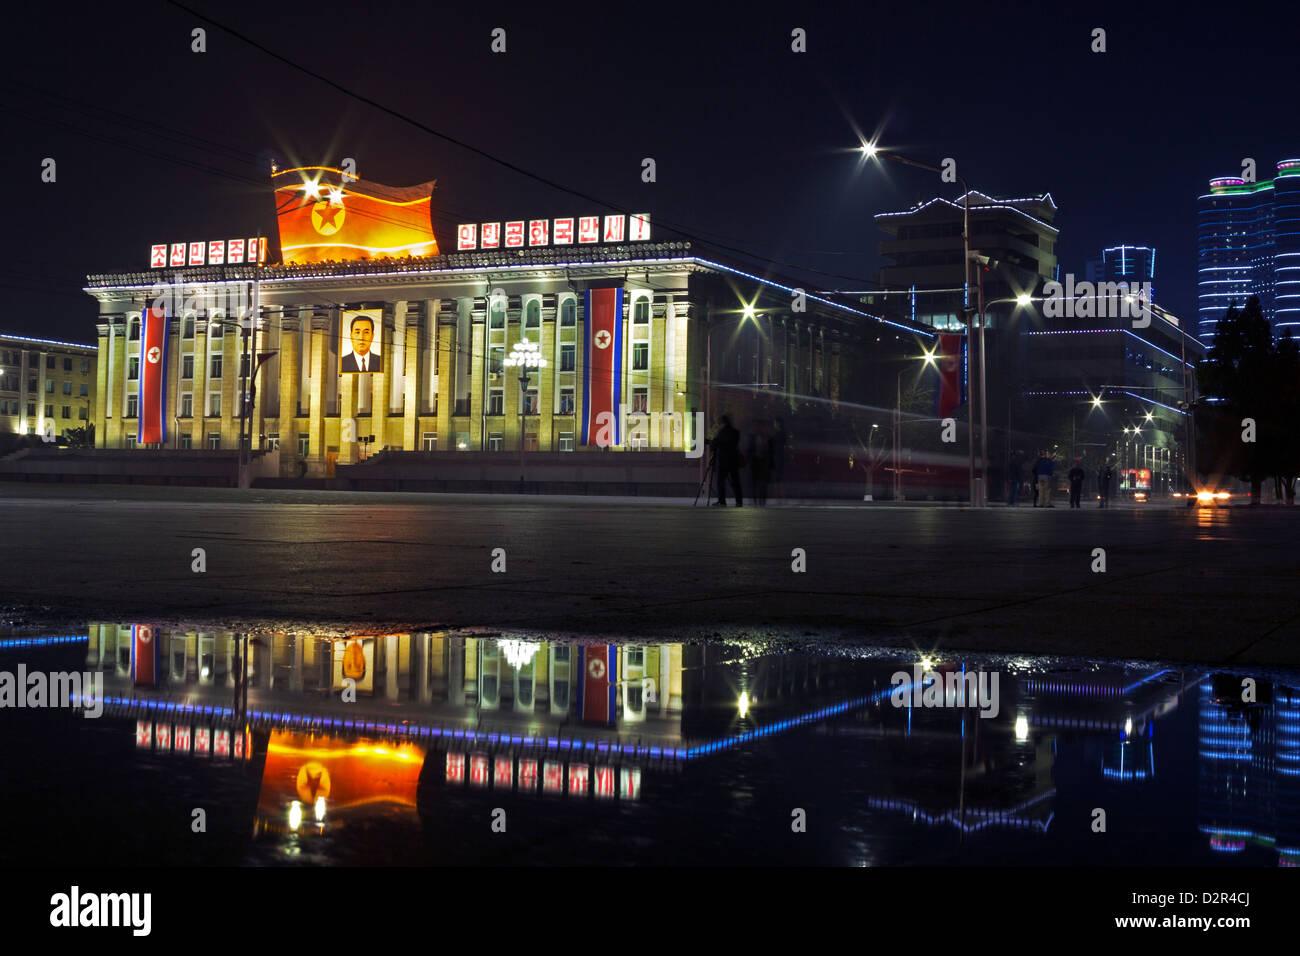 Kim Il Sung Square, illuminated at night, Pyongyang, Democratic People's Republic of Korea (DPRK), North Korea, - Stock Image